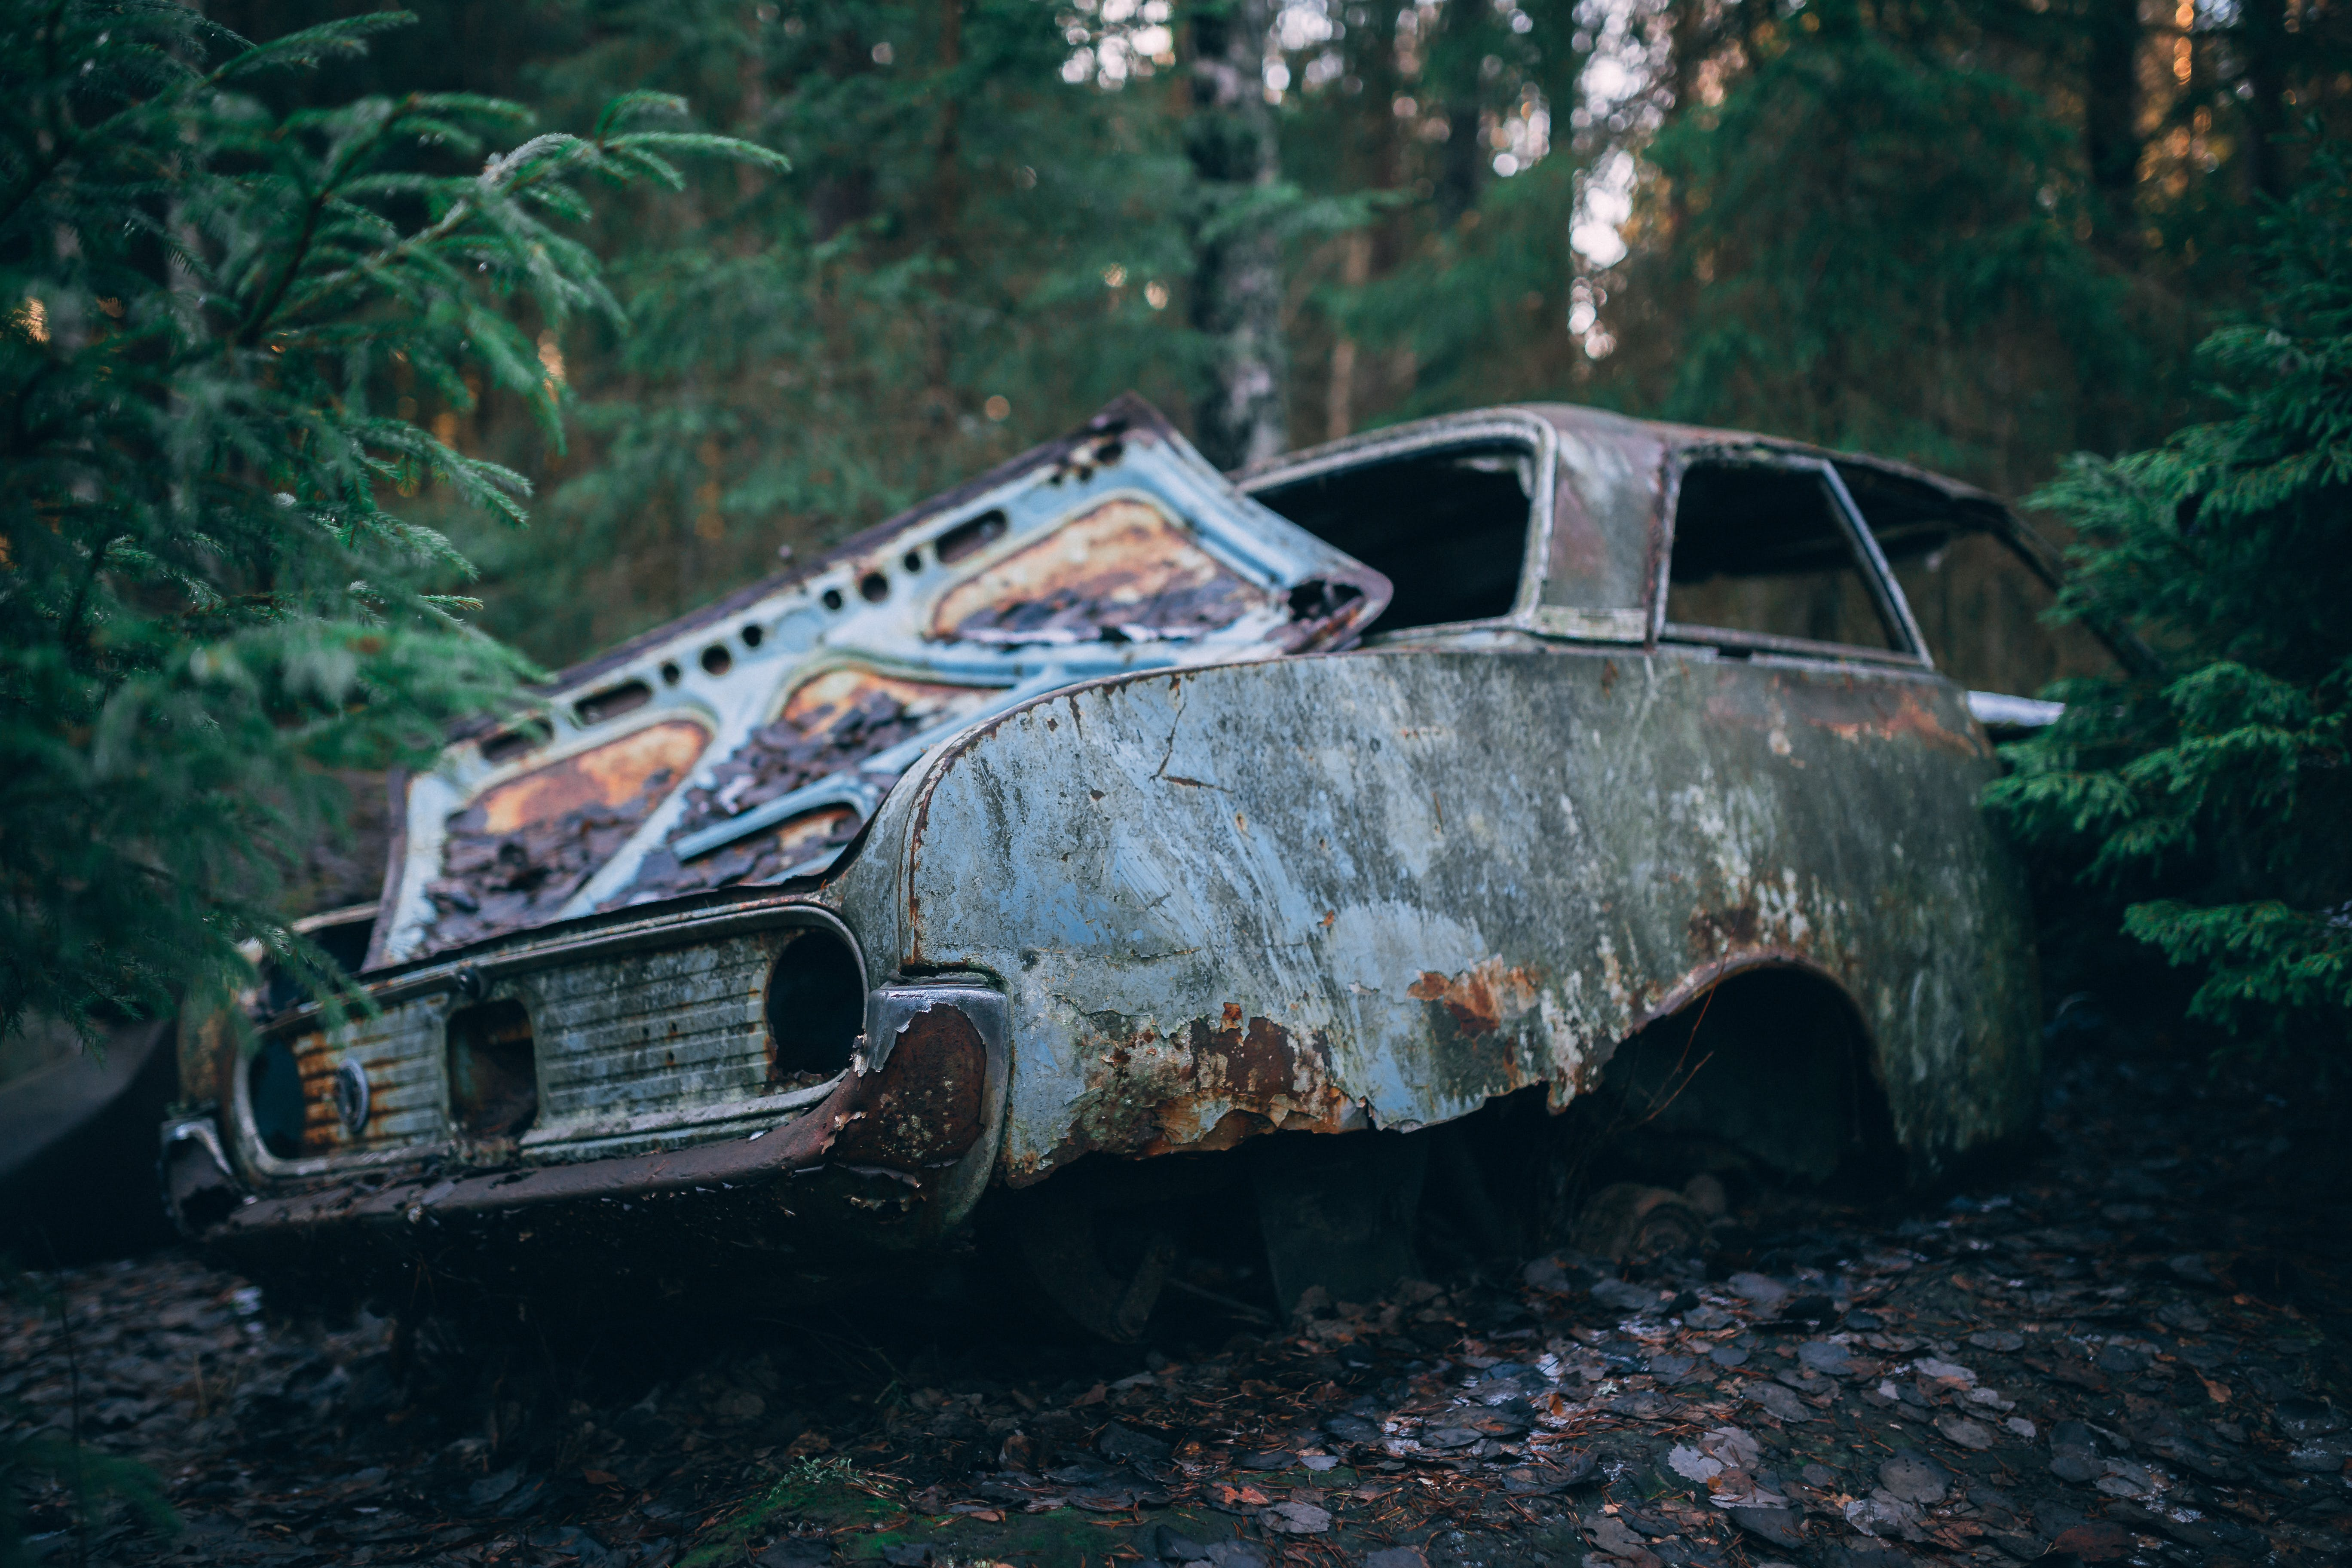 Abandoned Vehicle On Forest